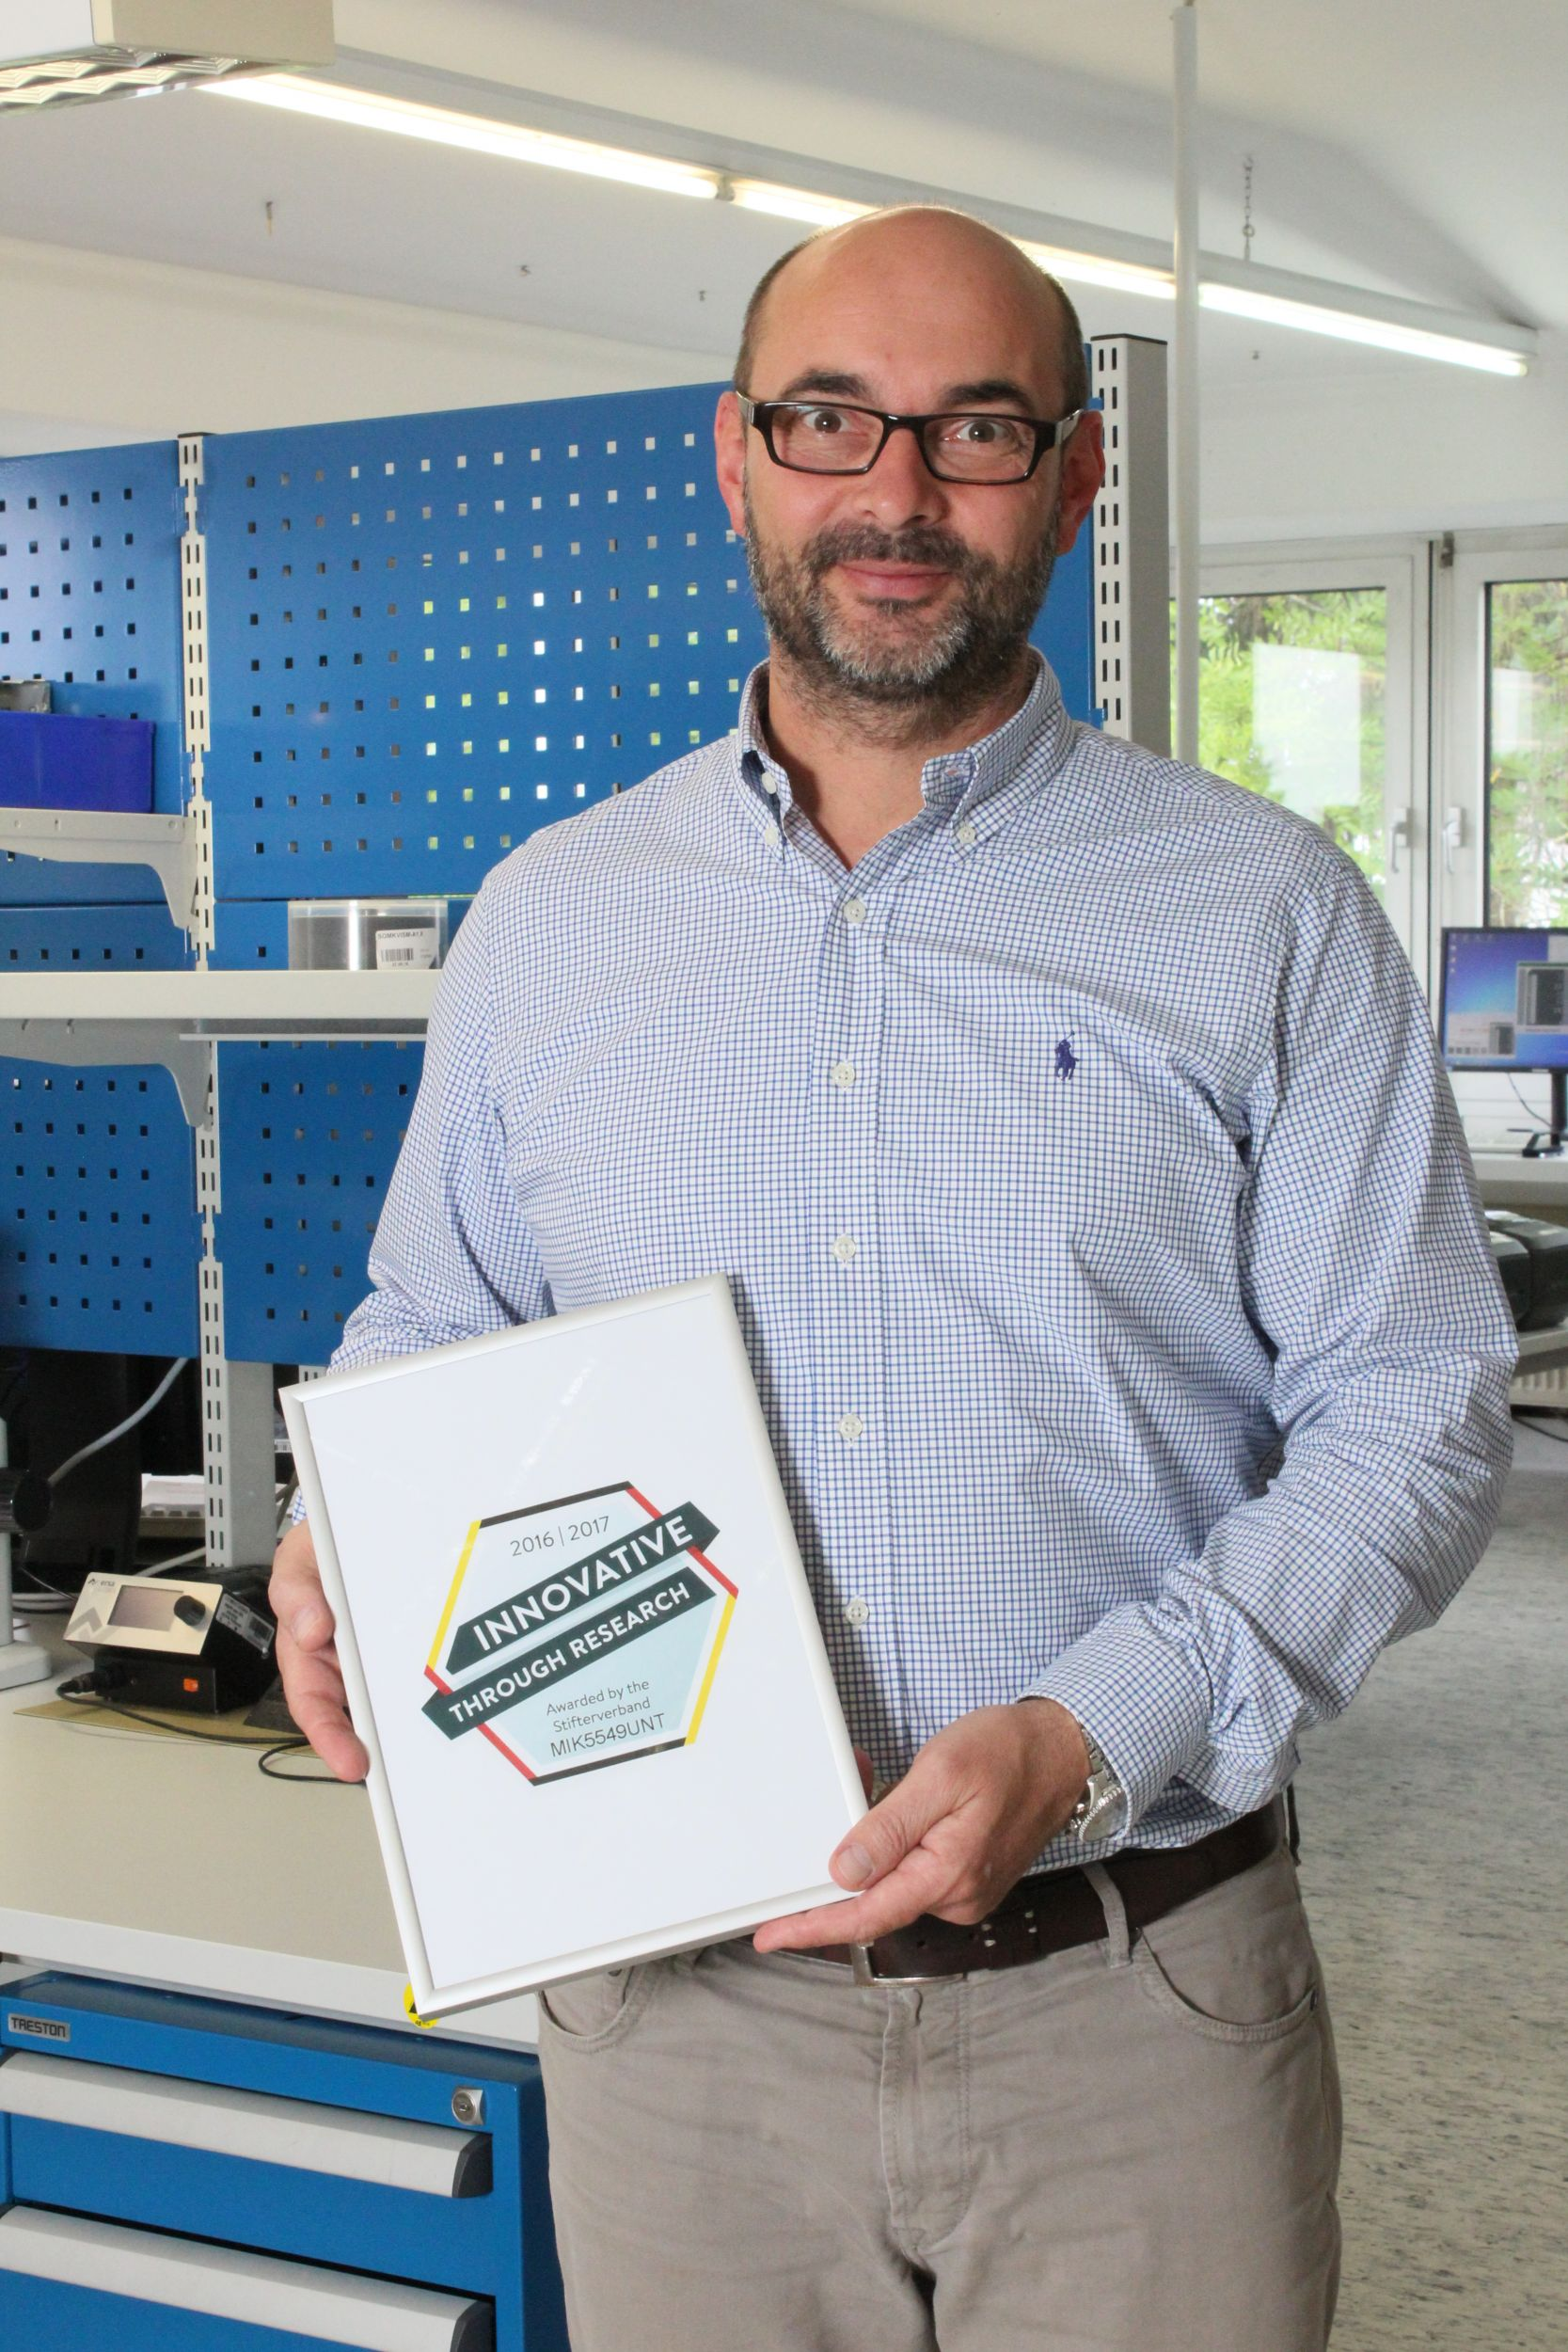 Innovationspreis für Mikrotron